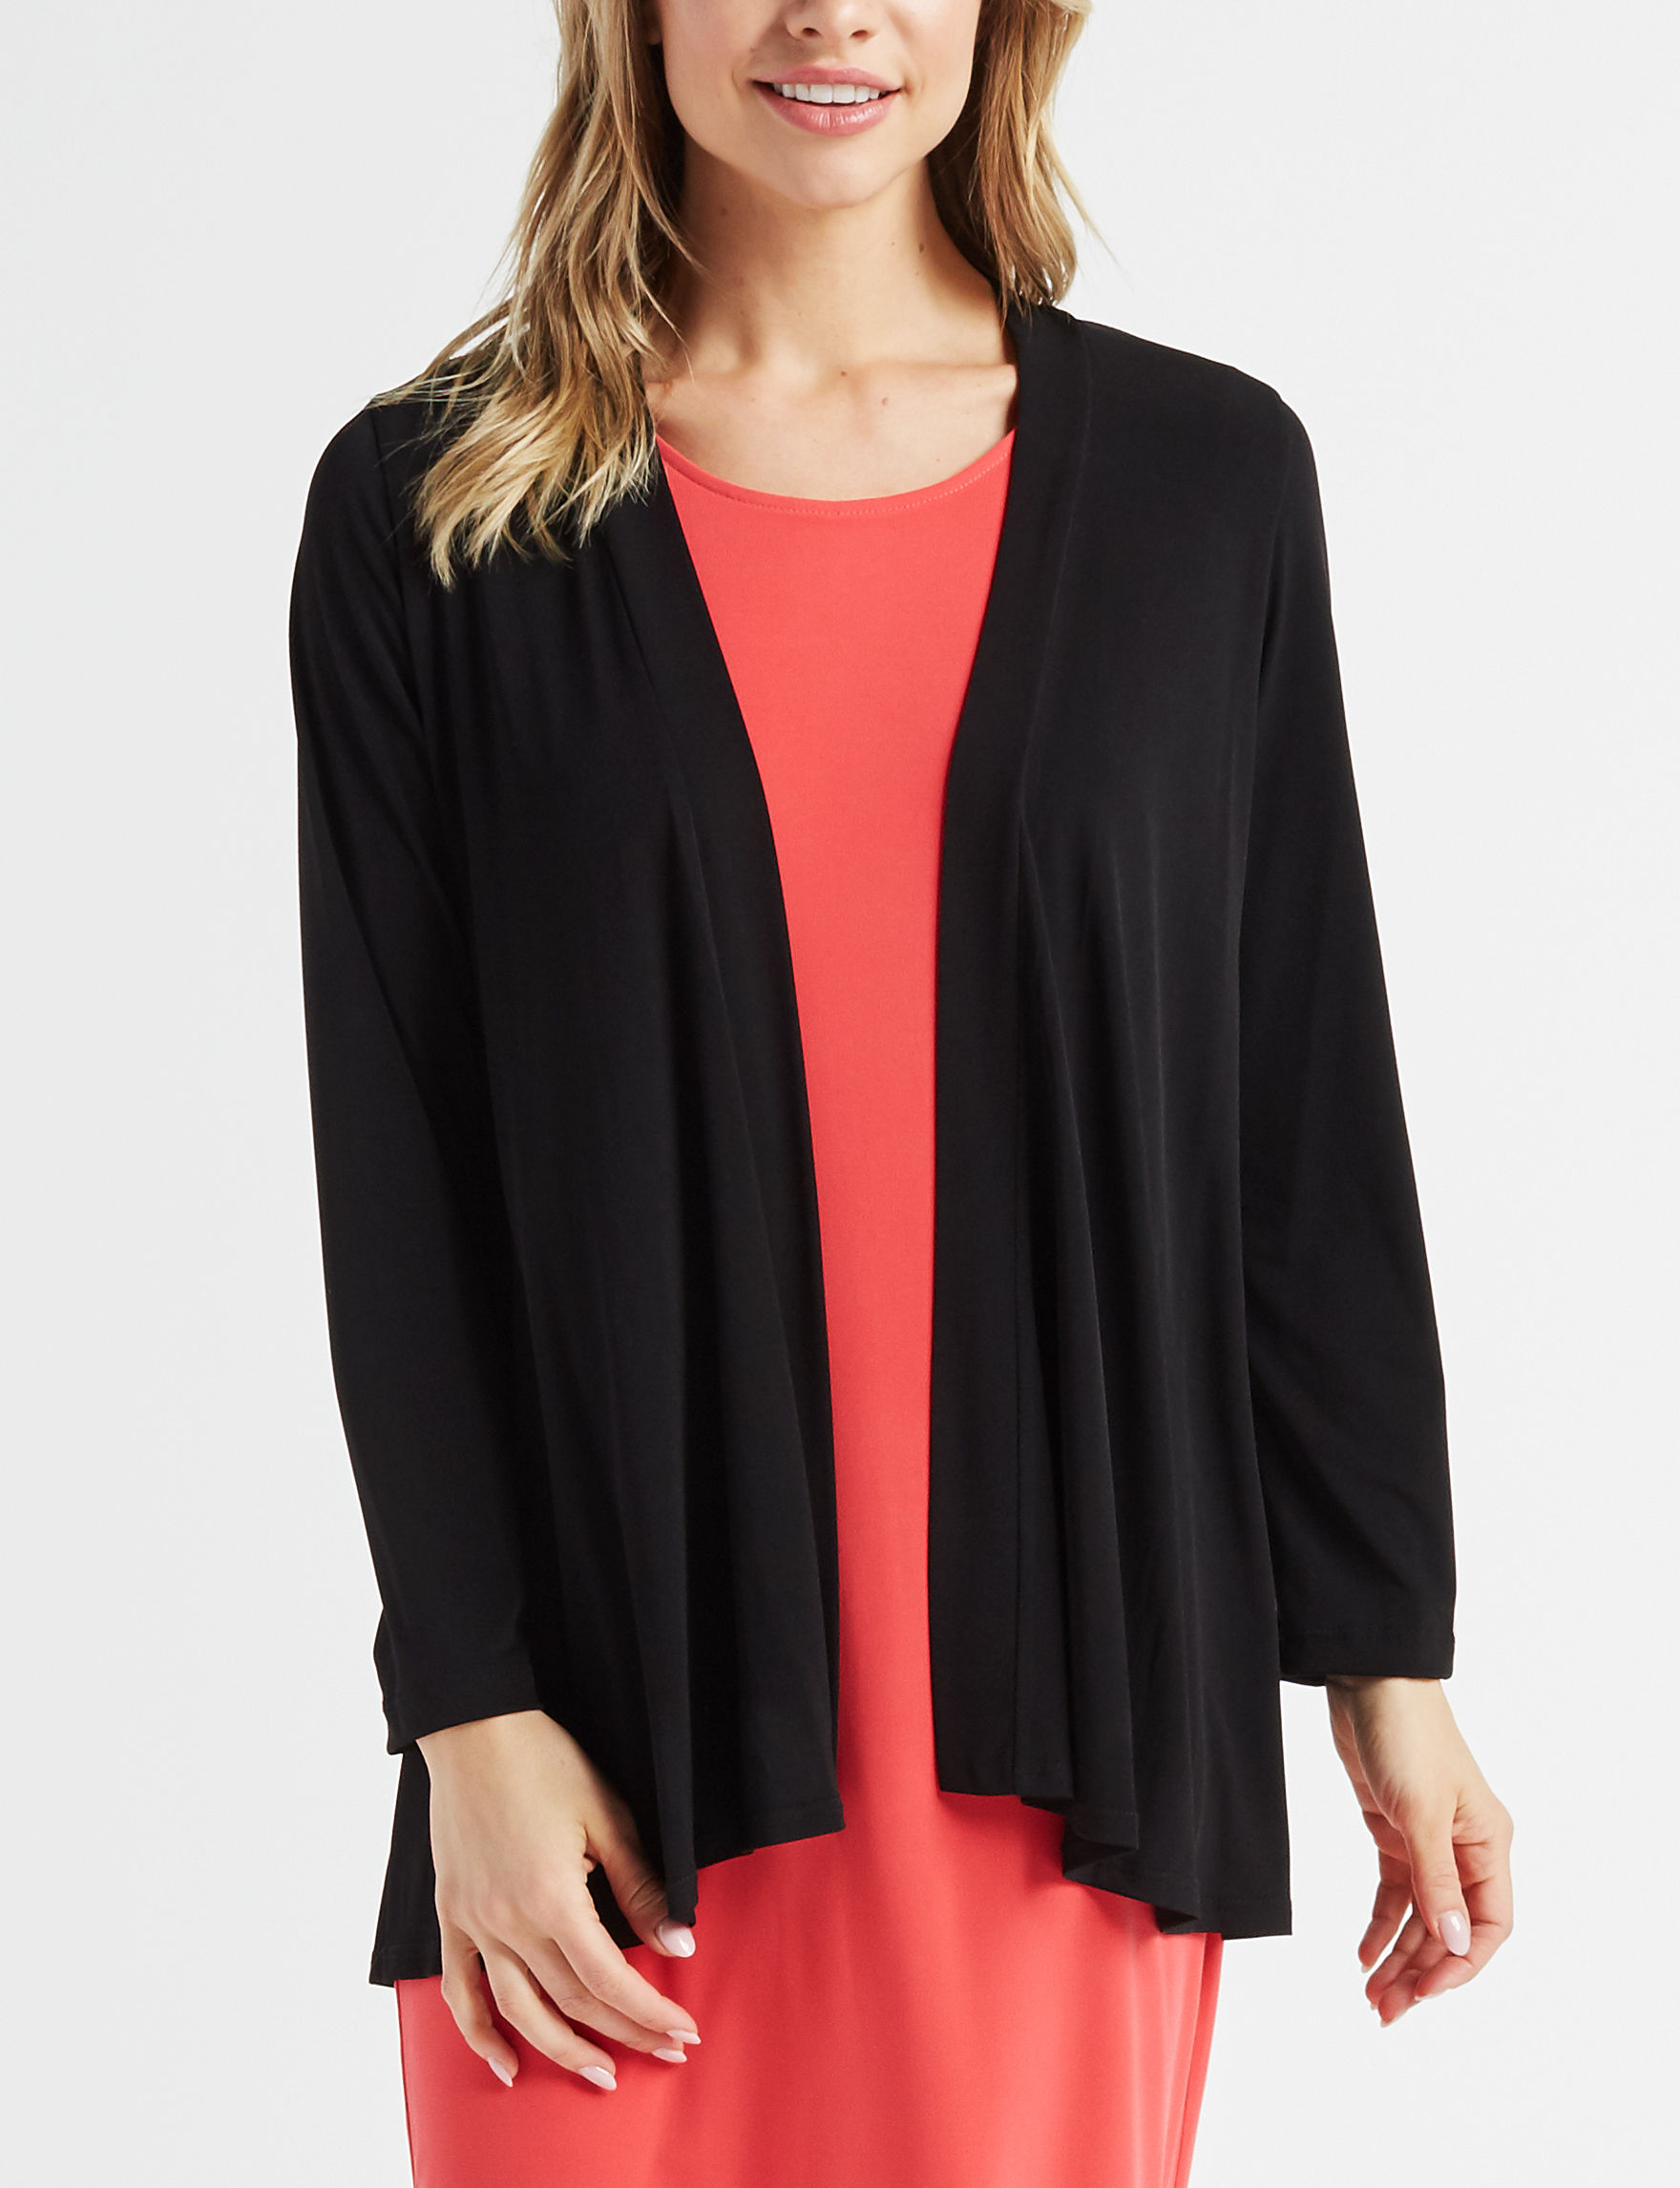 Lennie Black Cardigans Sweaters